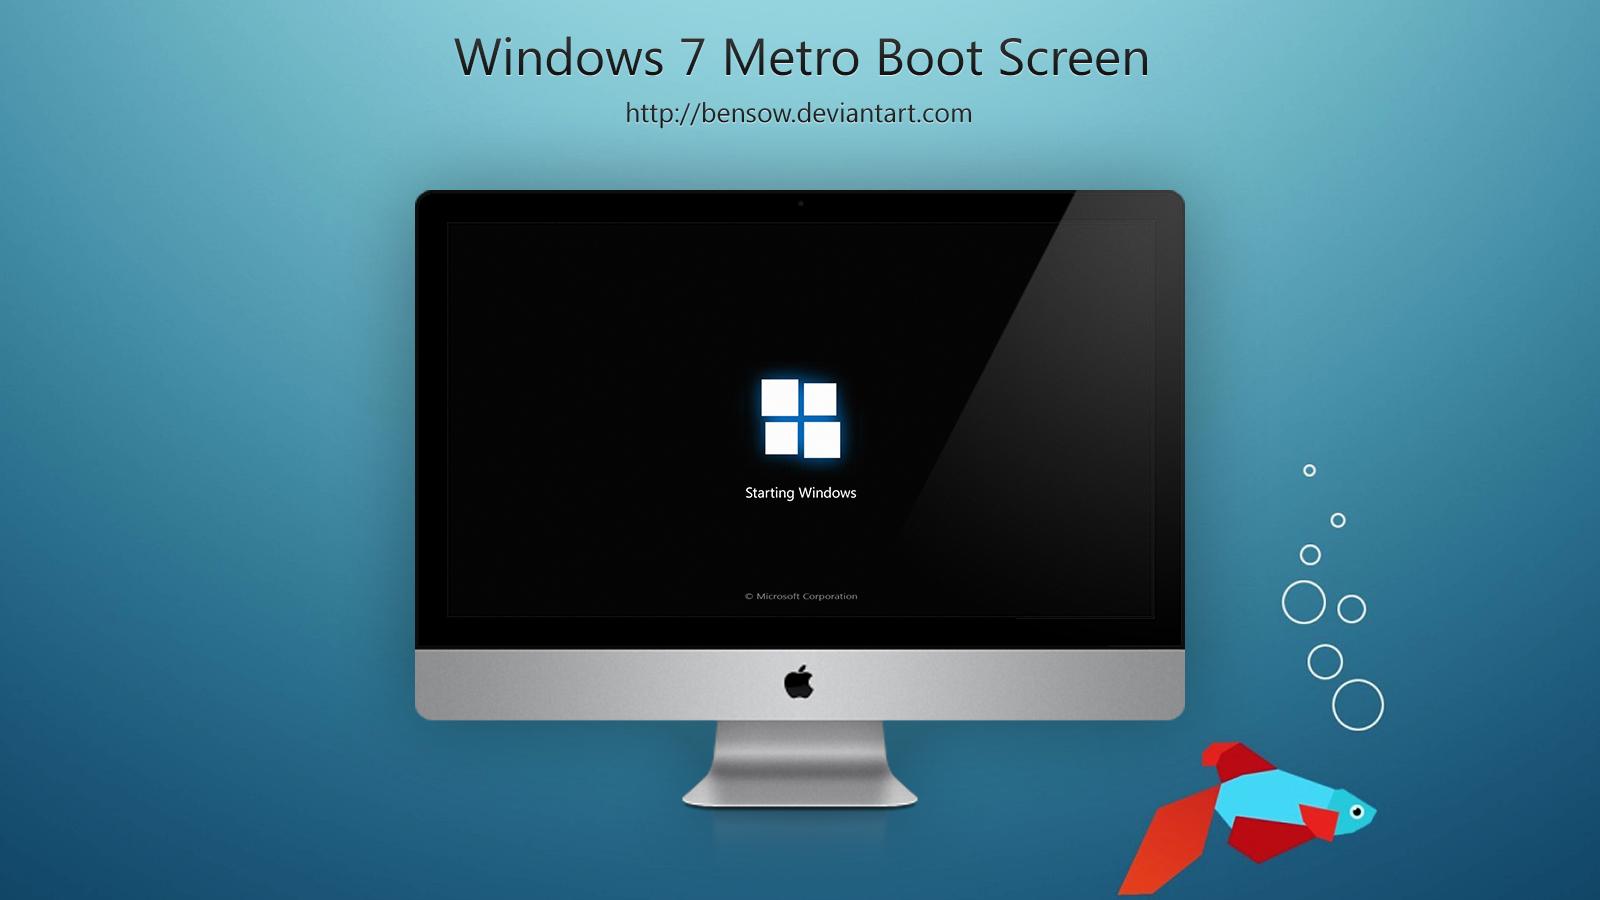 Windows 7 Boot Skin By Bensow On Deviantart